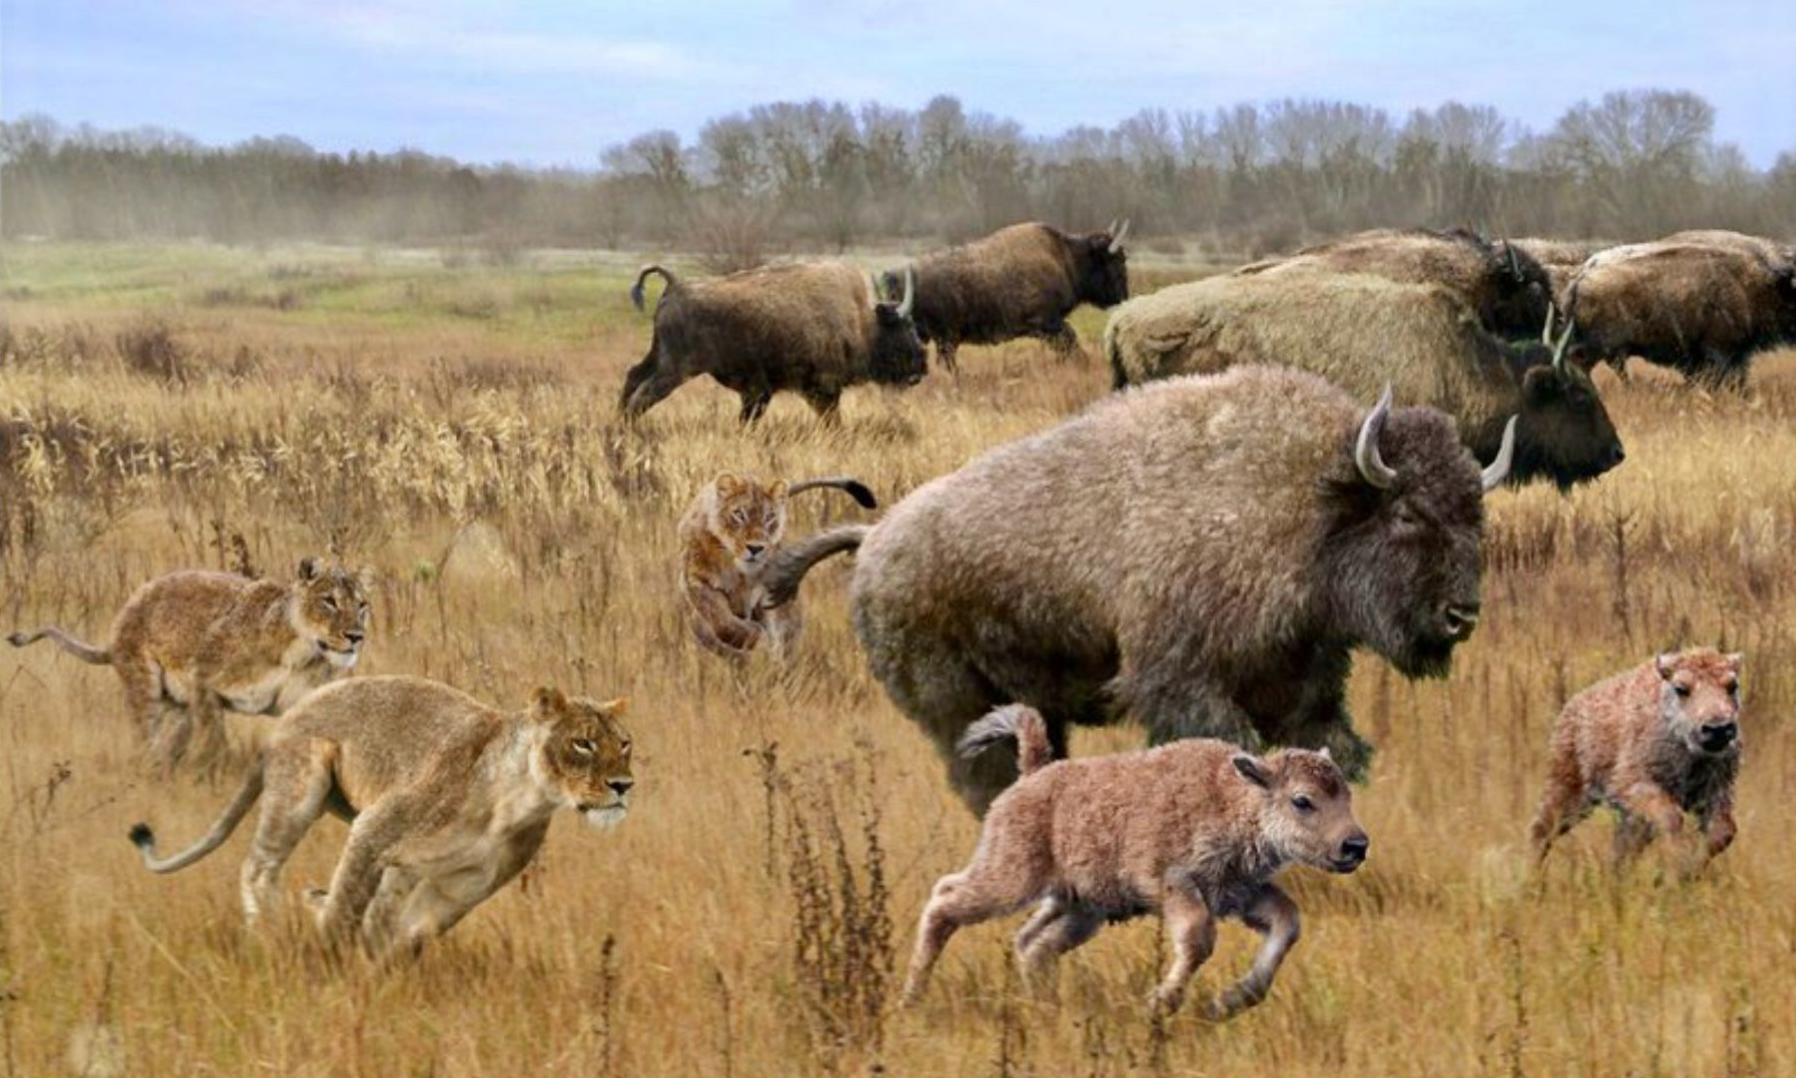 Kasai bison